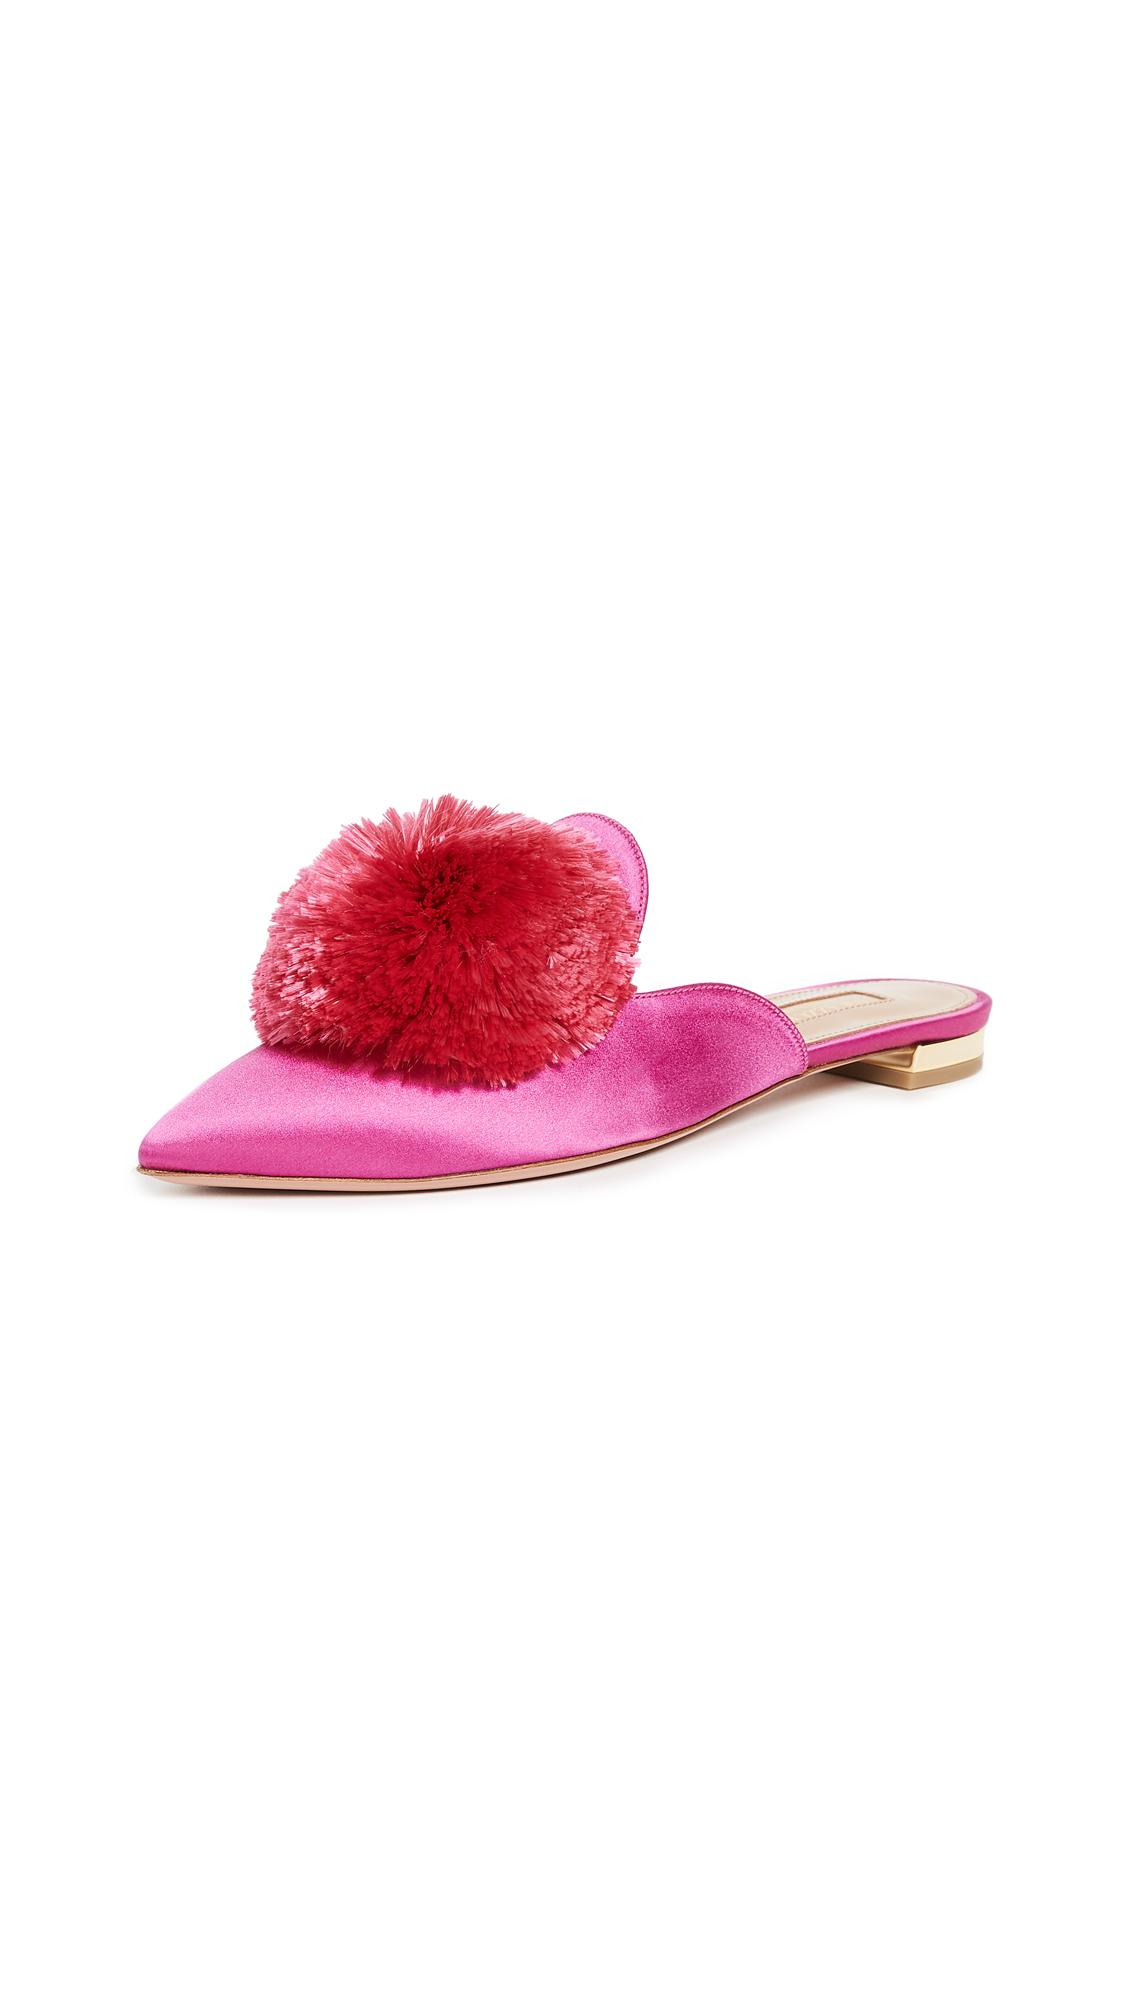 Aquazzura Powder Puff Flats - Azalea Pink